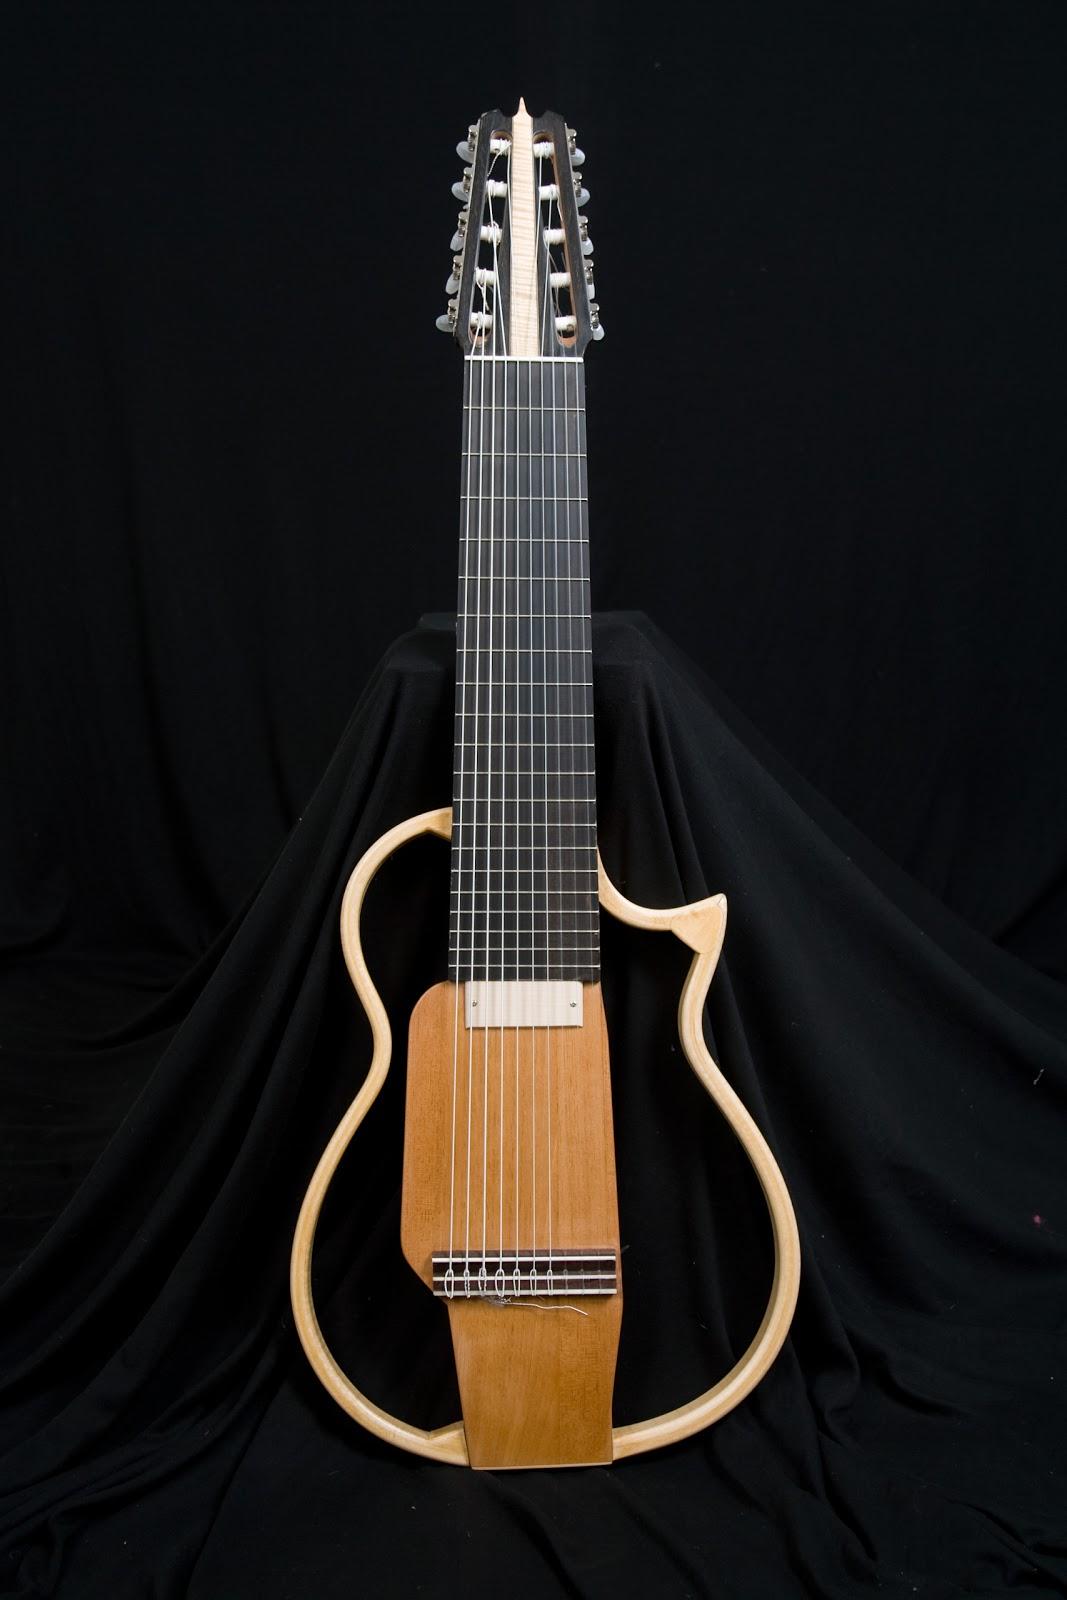 Best Silent Travel Guitar